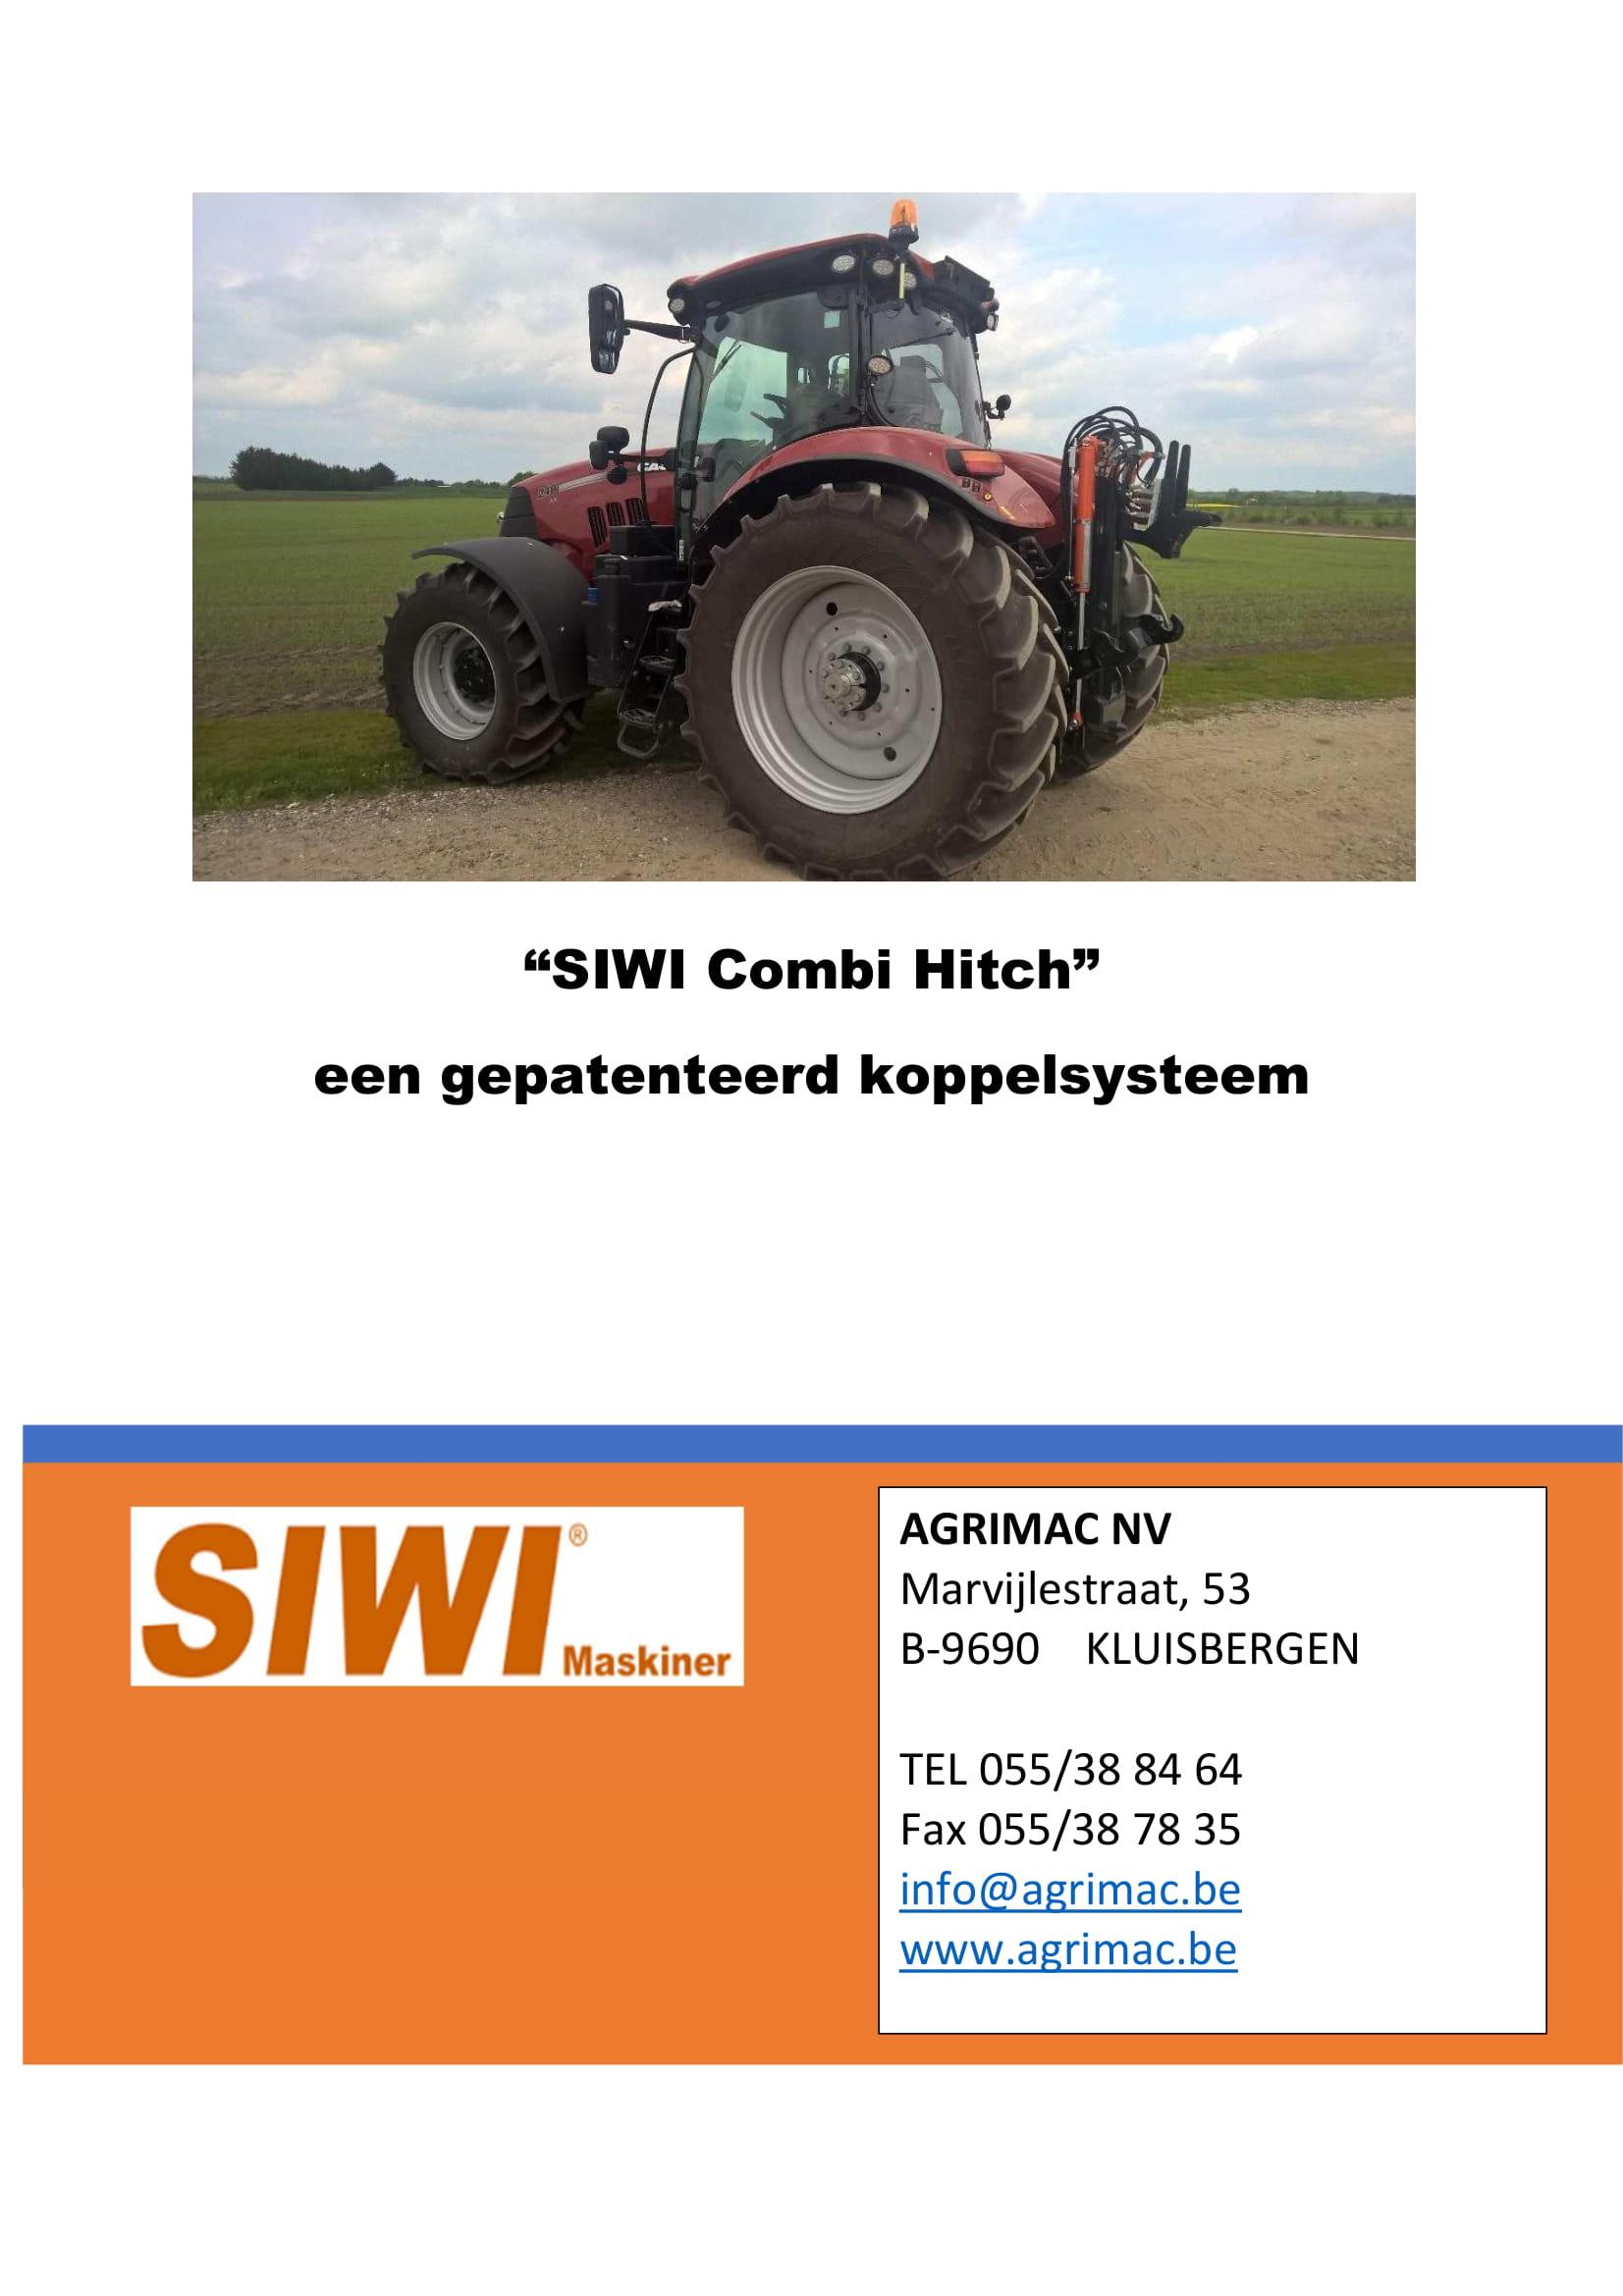 SIWI Combi Hitch NL